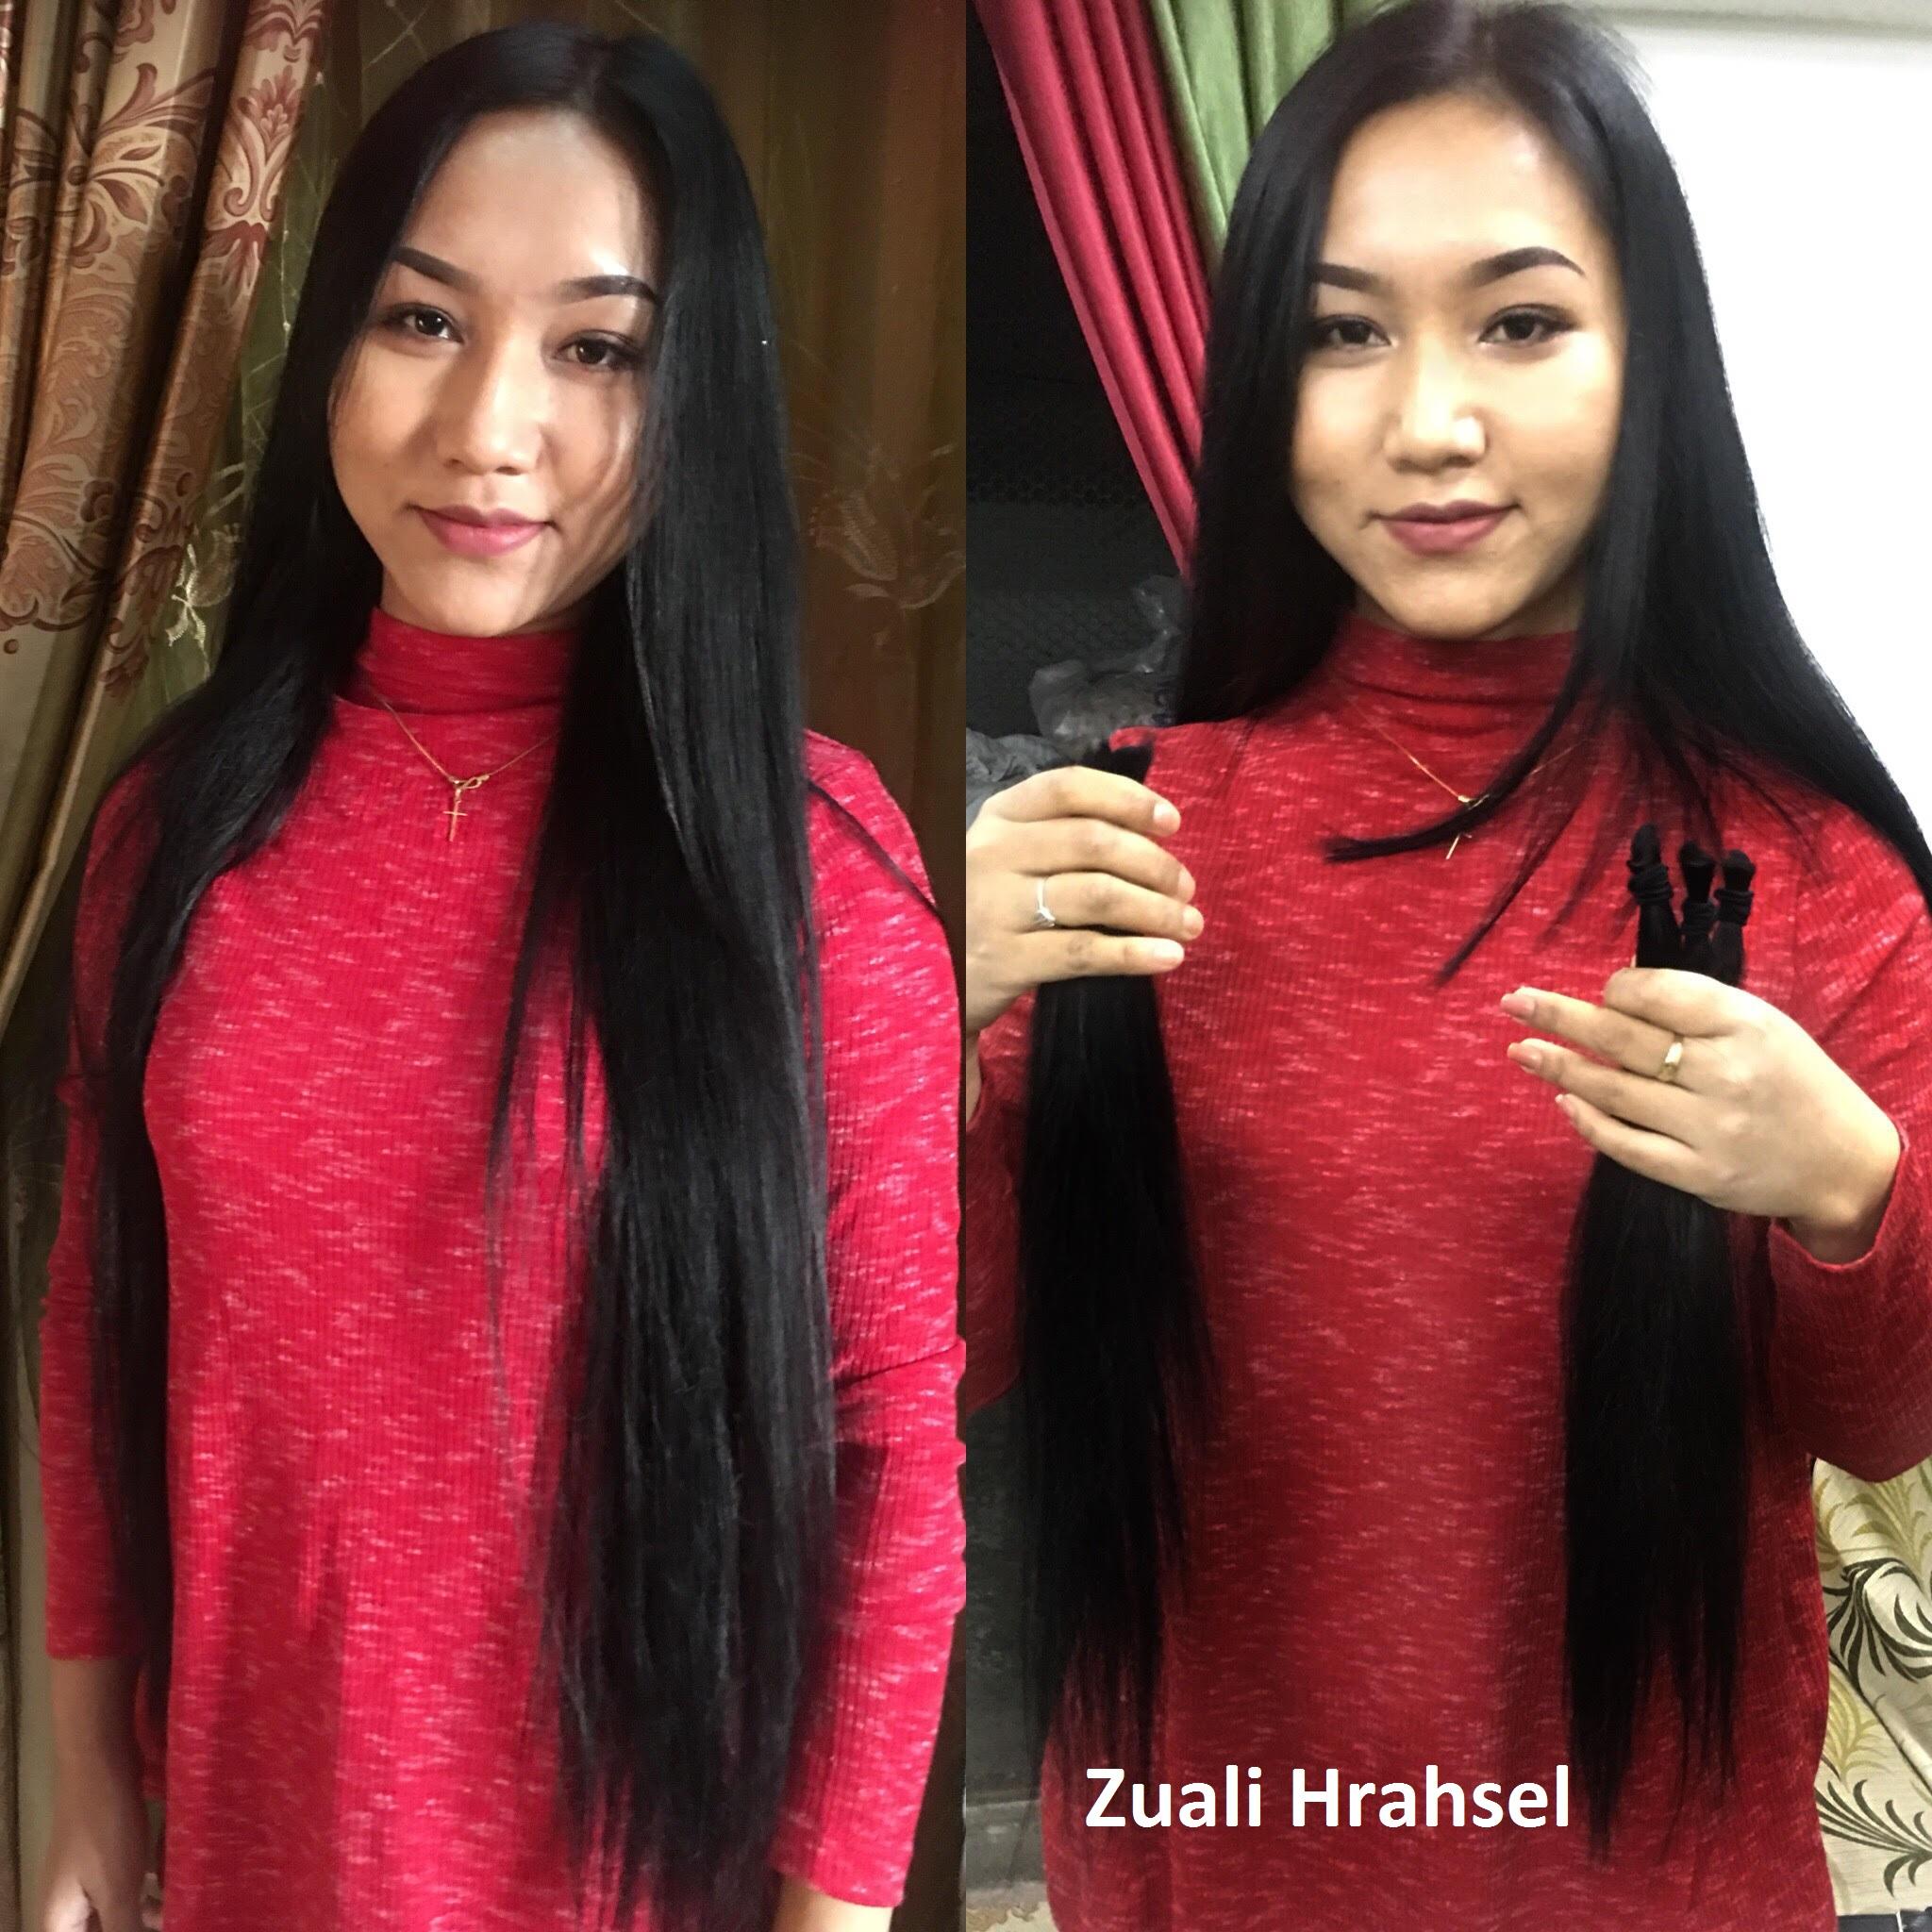 zuali hrahsel